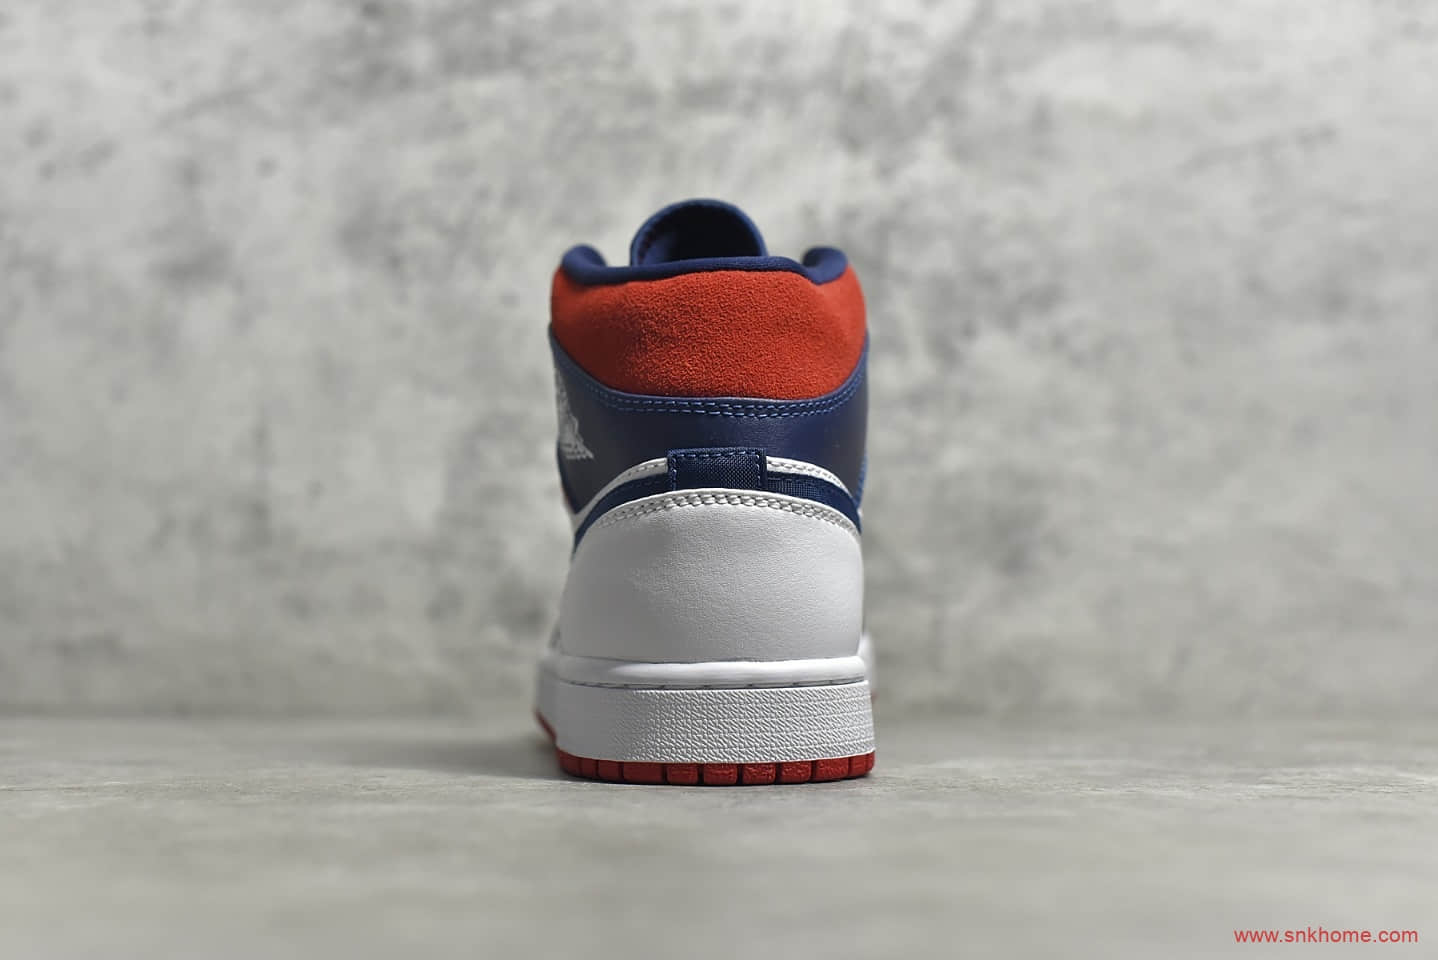 AJ1中帮美国队配色 Air Jordan 1 MId SE USA 纯原版本AJ1白蓝红市面唯一纯原级别 货号:852542-104-潮流者之家